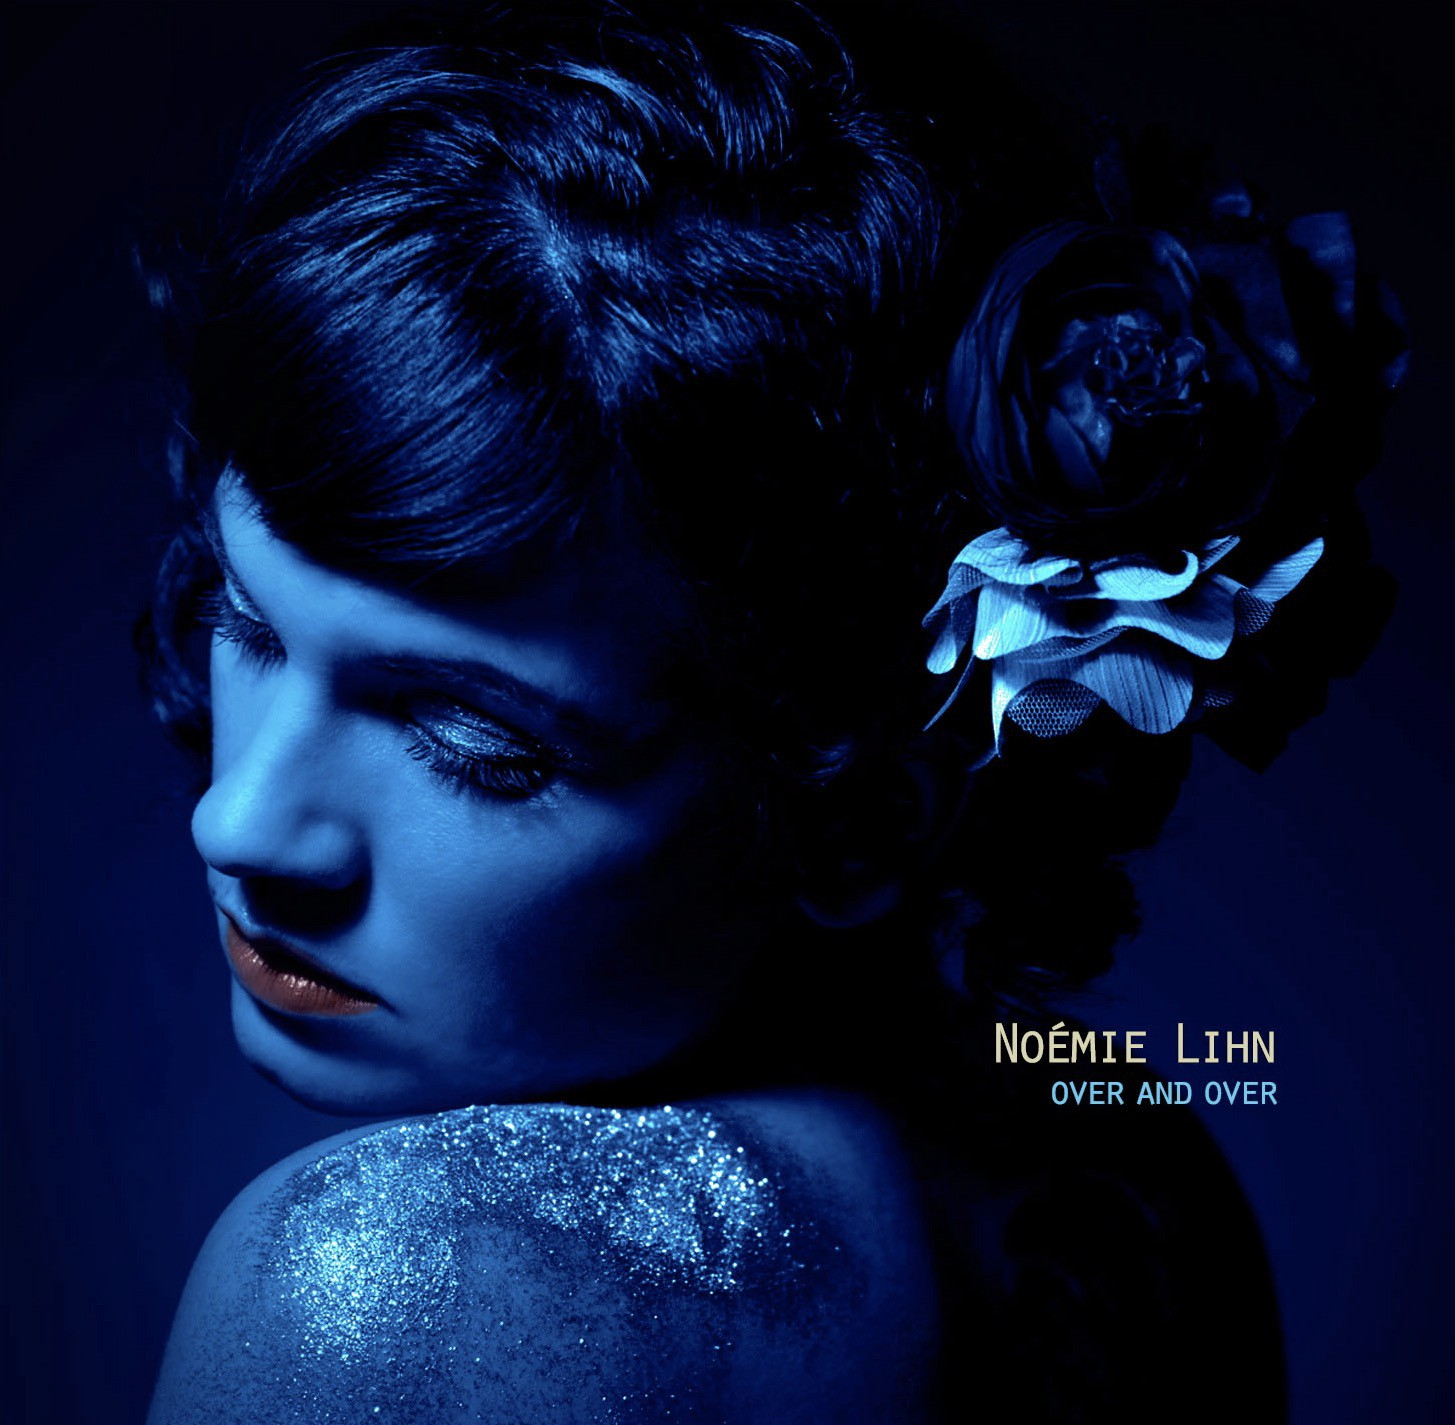 Noémie Lihn